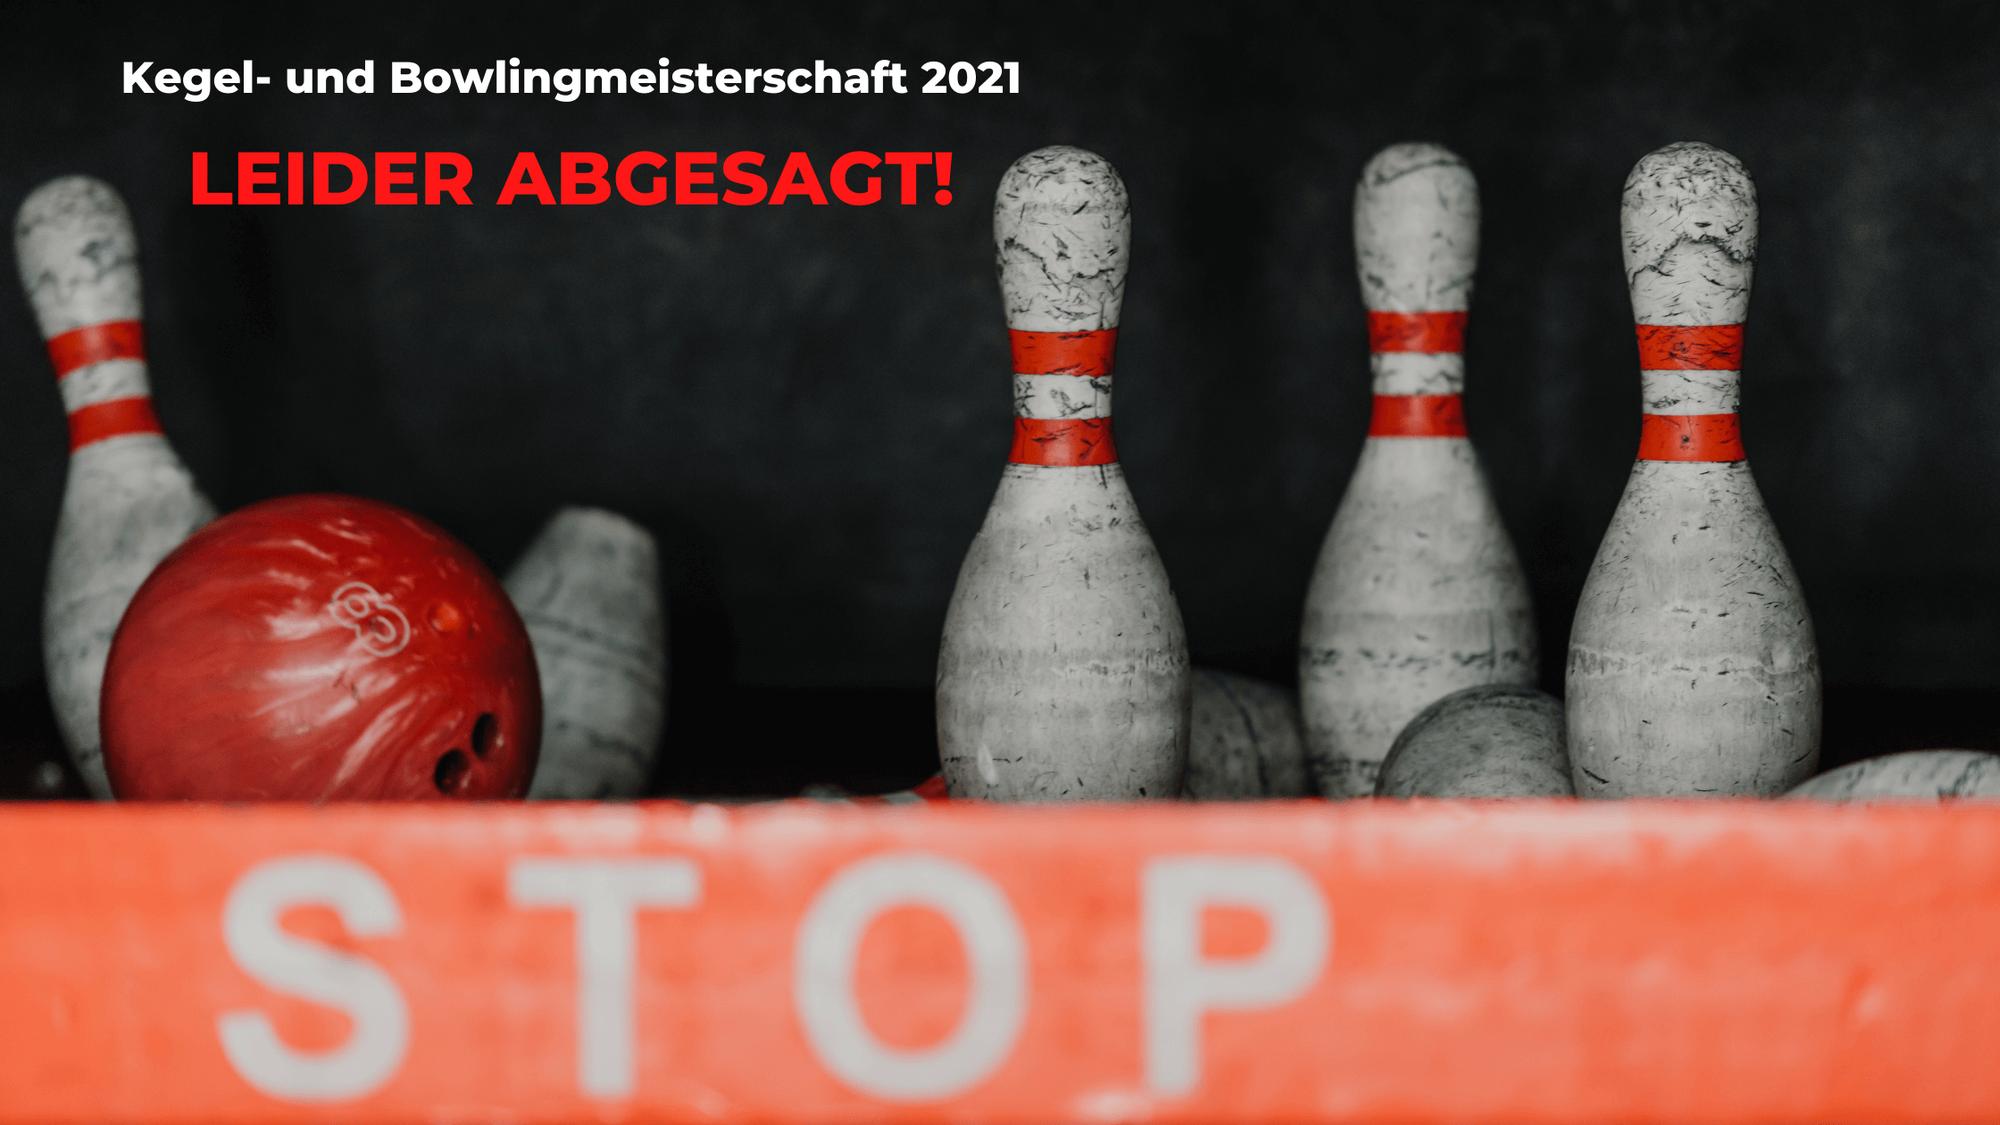 Kegel- und Bowlingmeisterschaft 2021: Leider abgesagt!